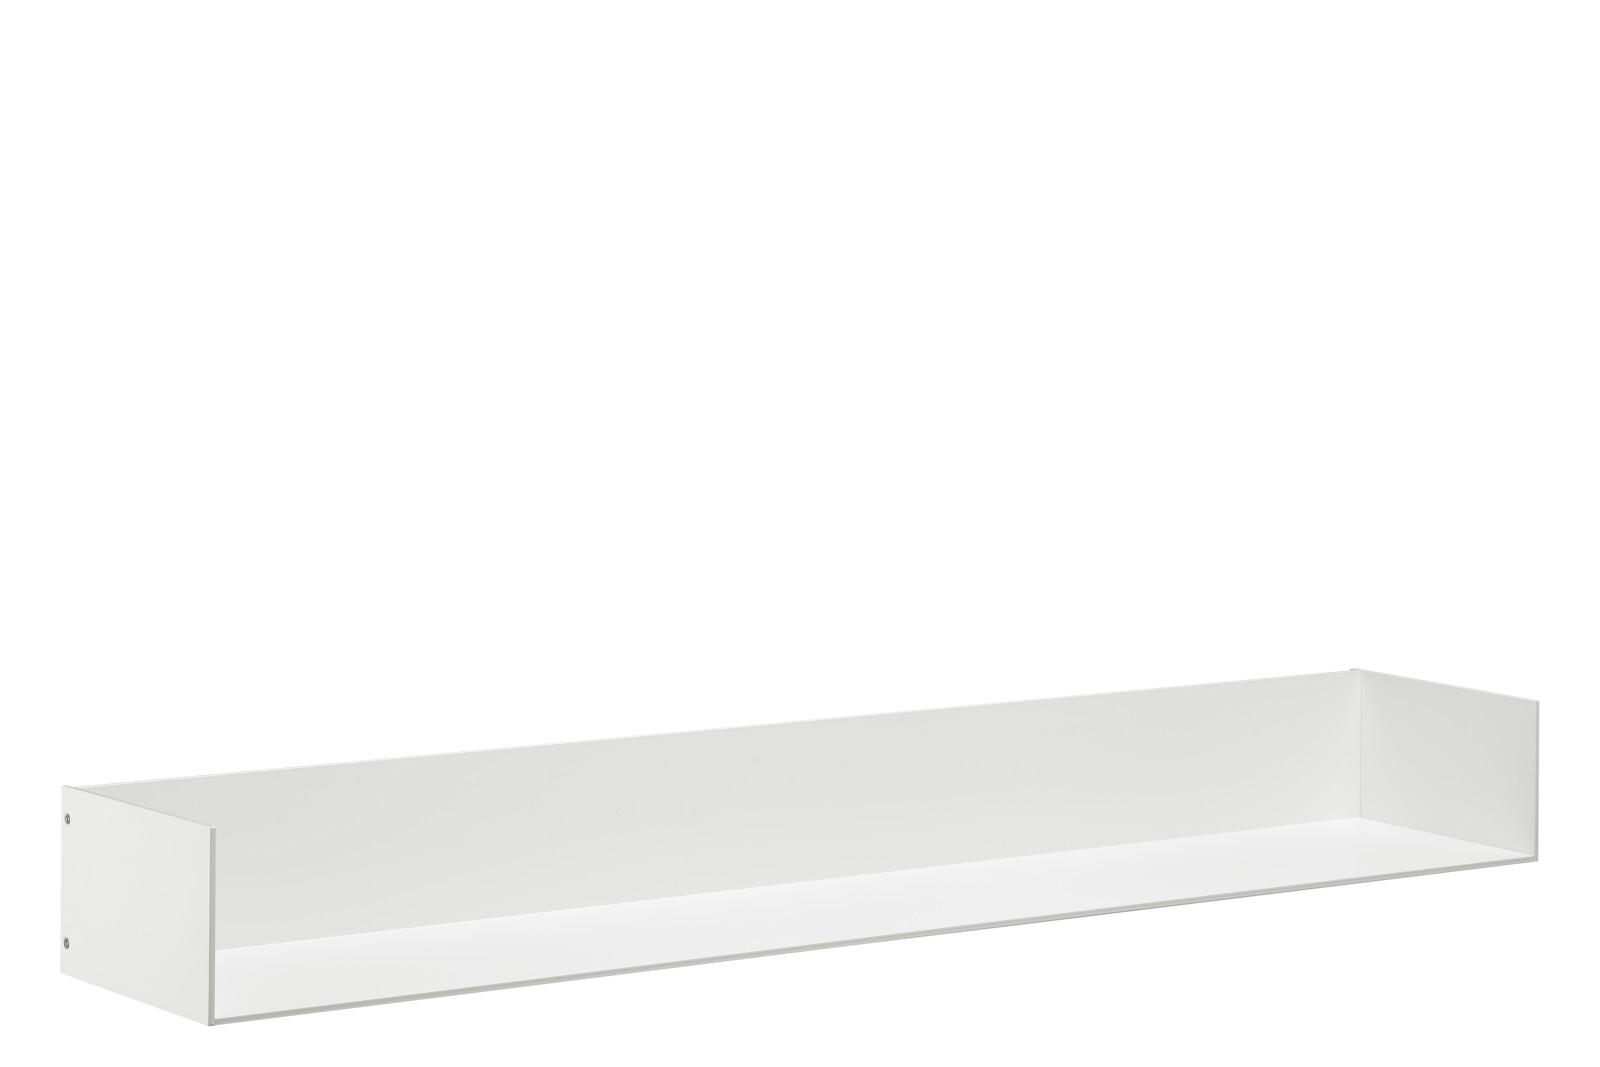 SH06 Profil Shelf with Side Panels Signal White, Long